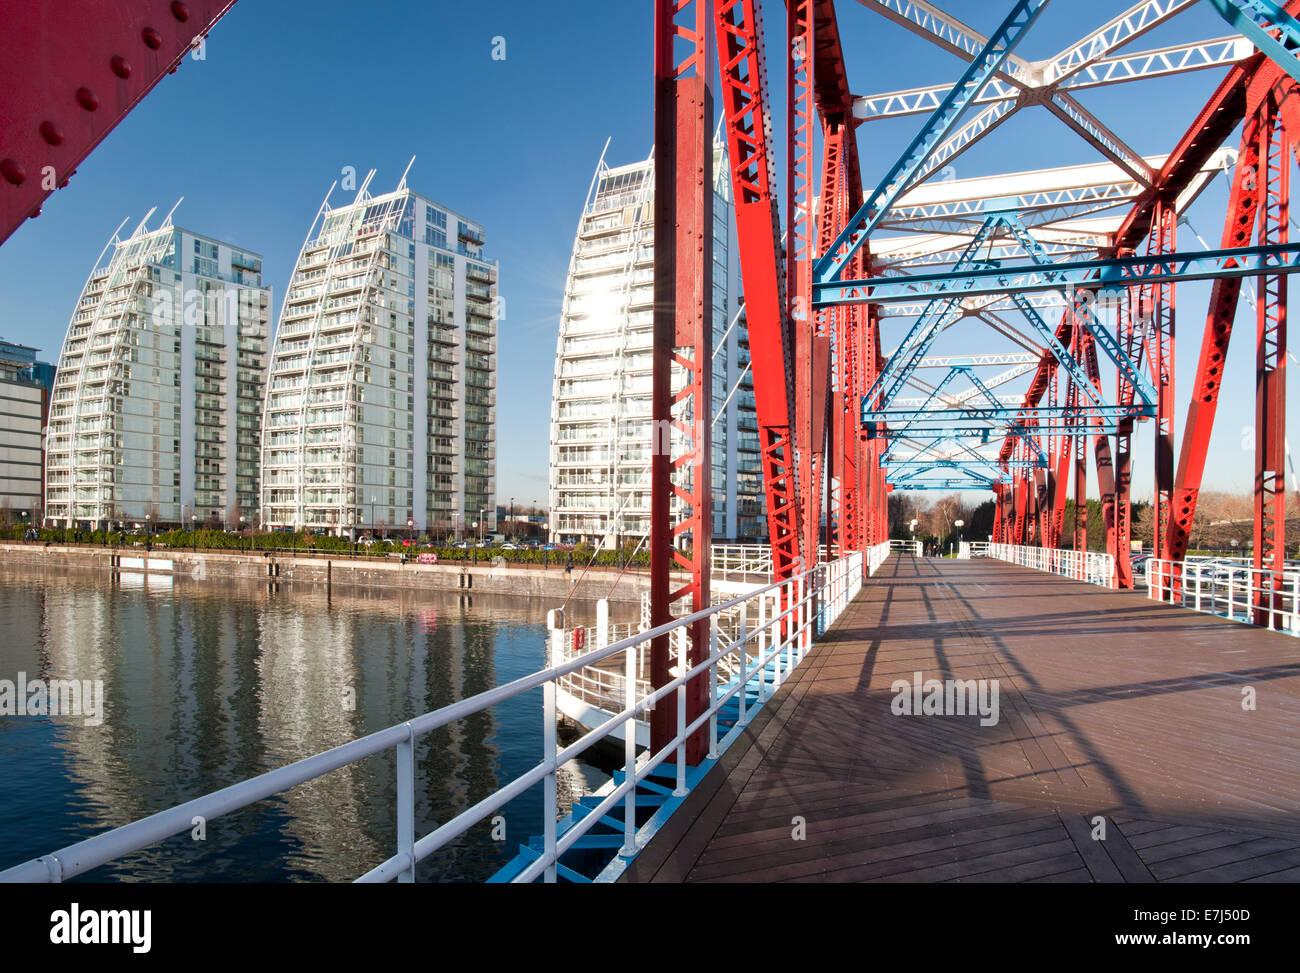 NV Apartments & The Detroit Swing Bridge, Huron Basin, Salford Quays, Greater Manchester, England, UK - Stock Image